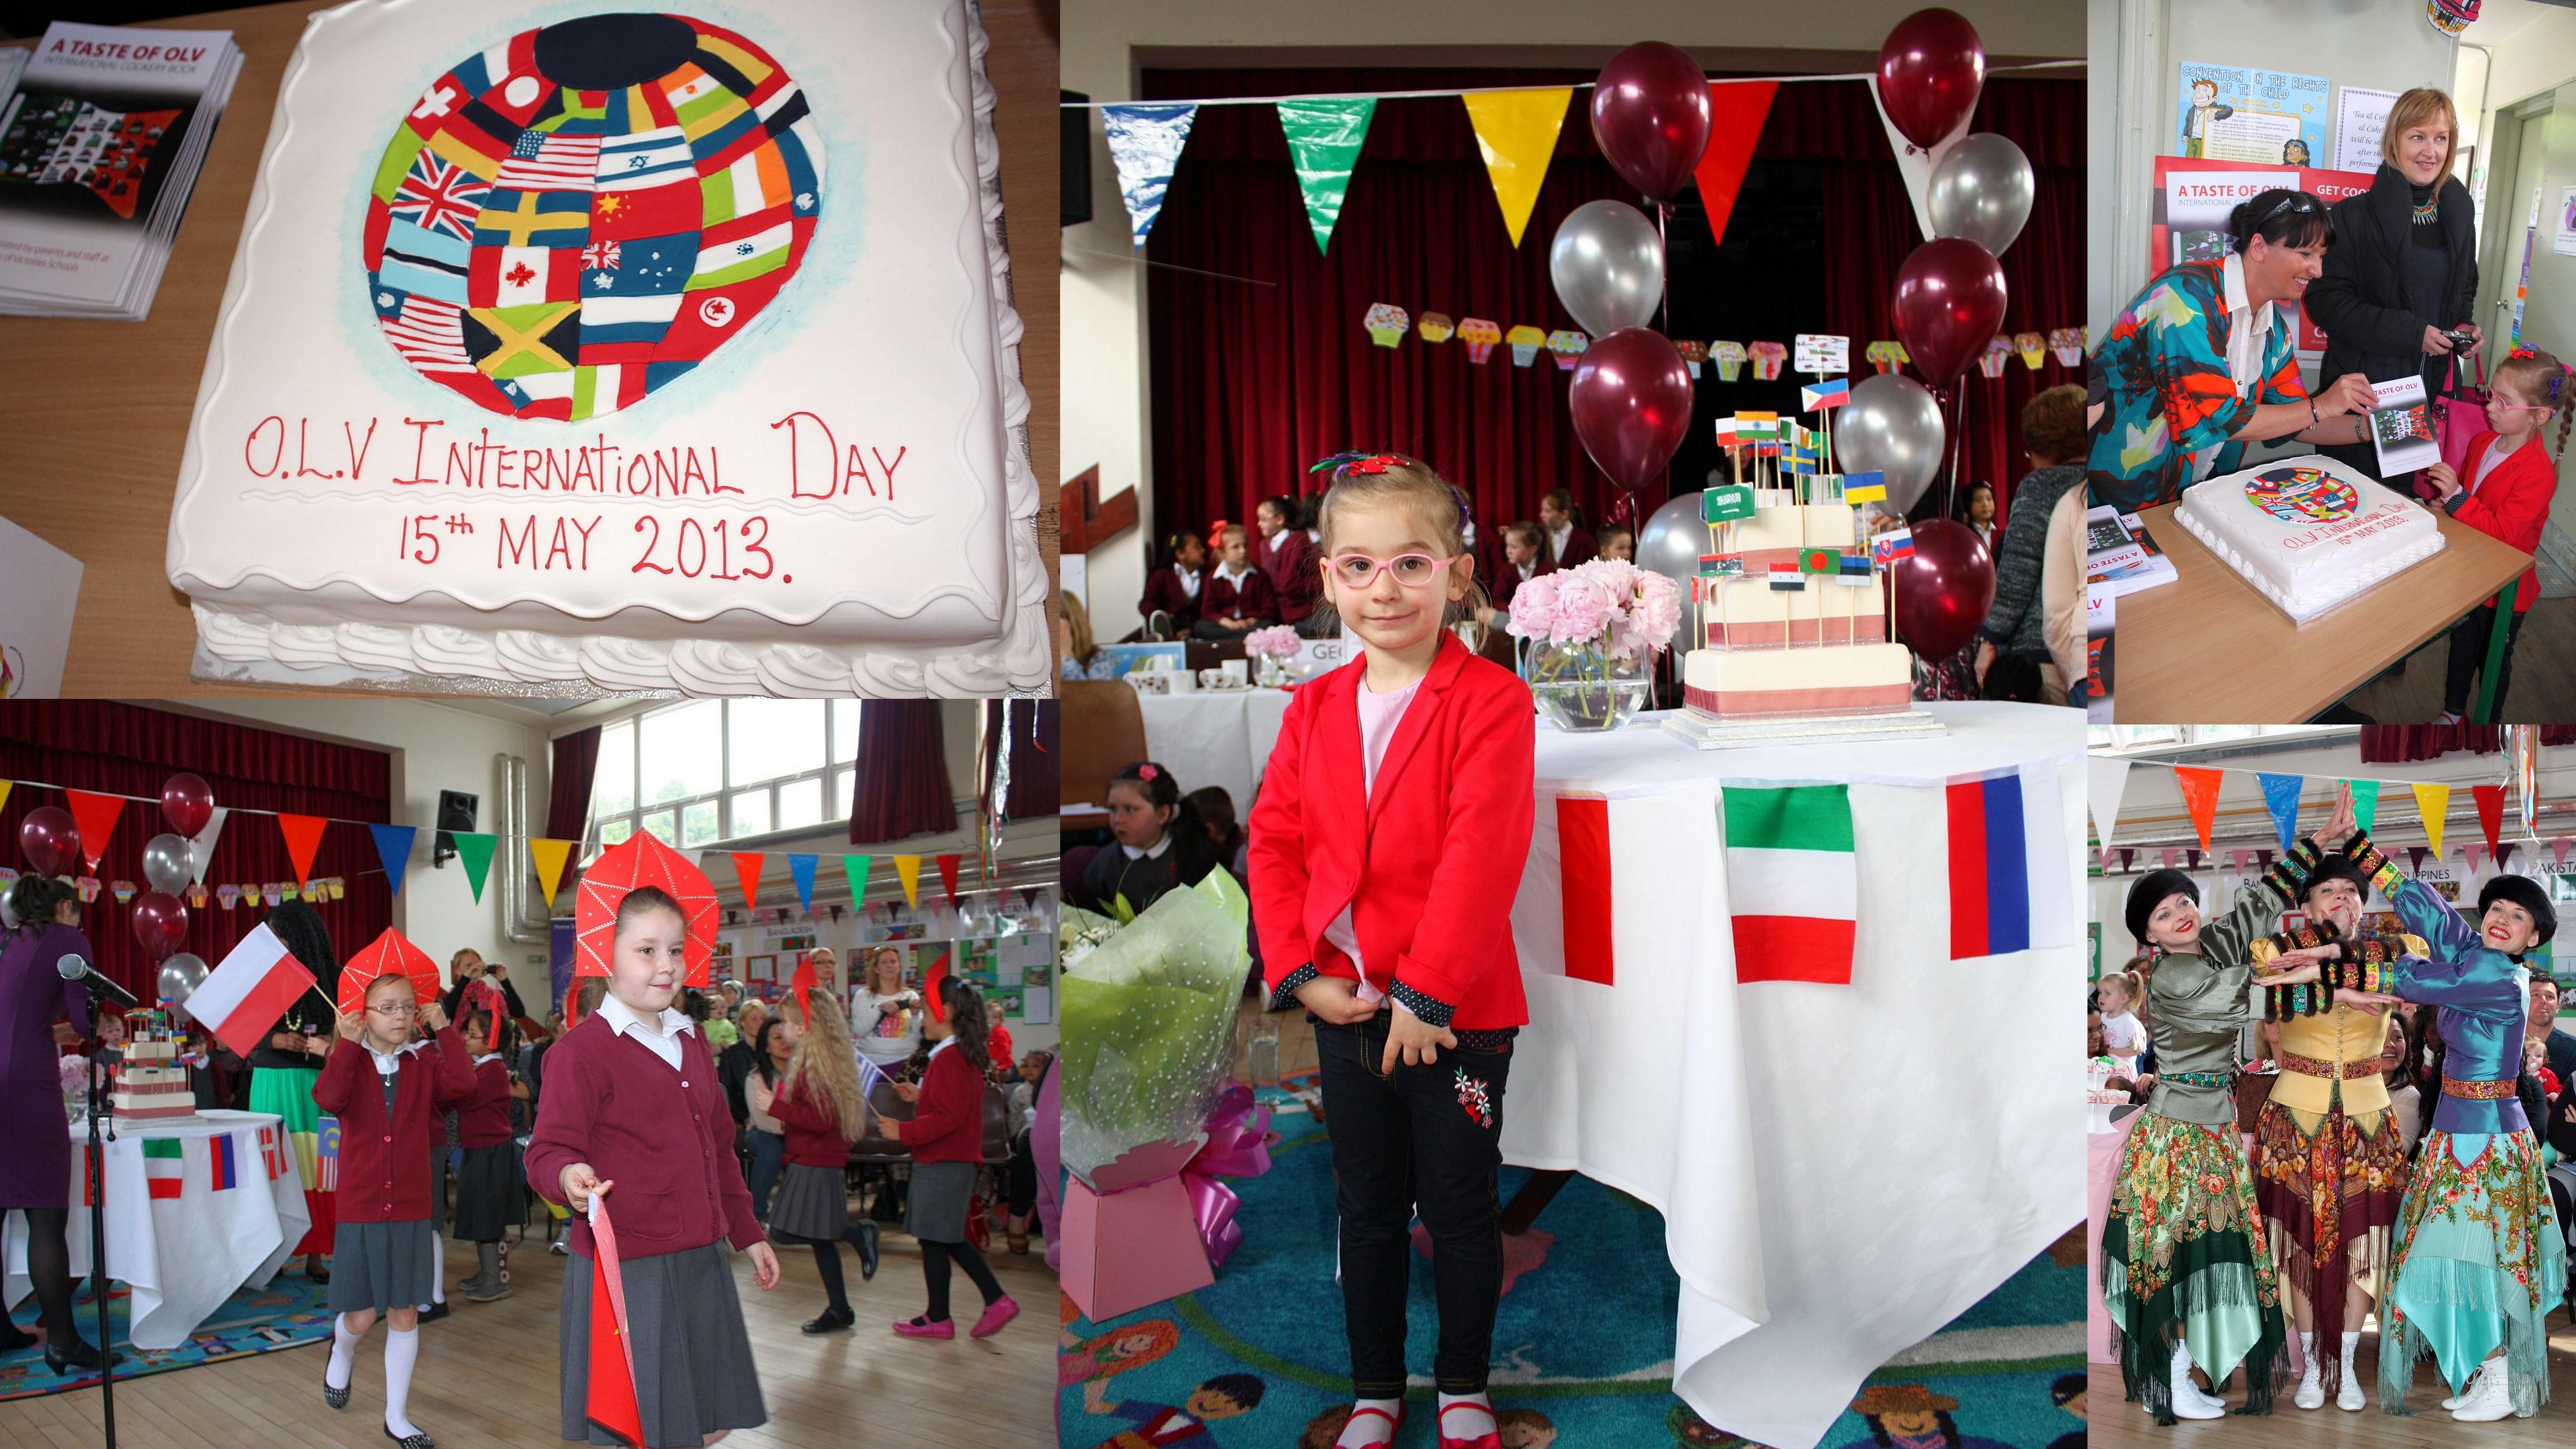 International Cake Day